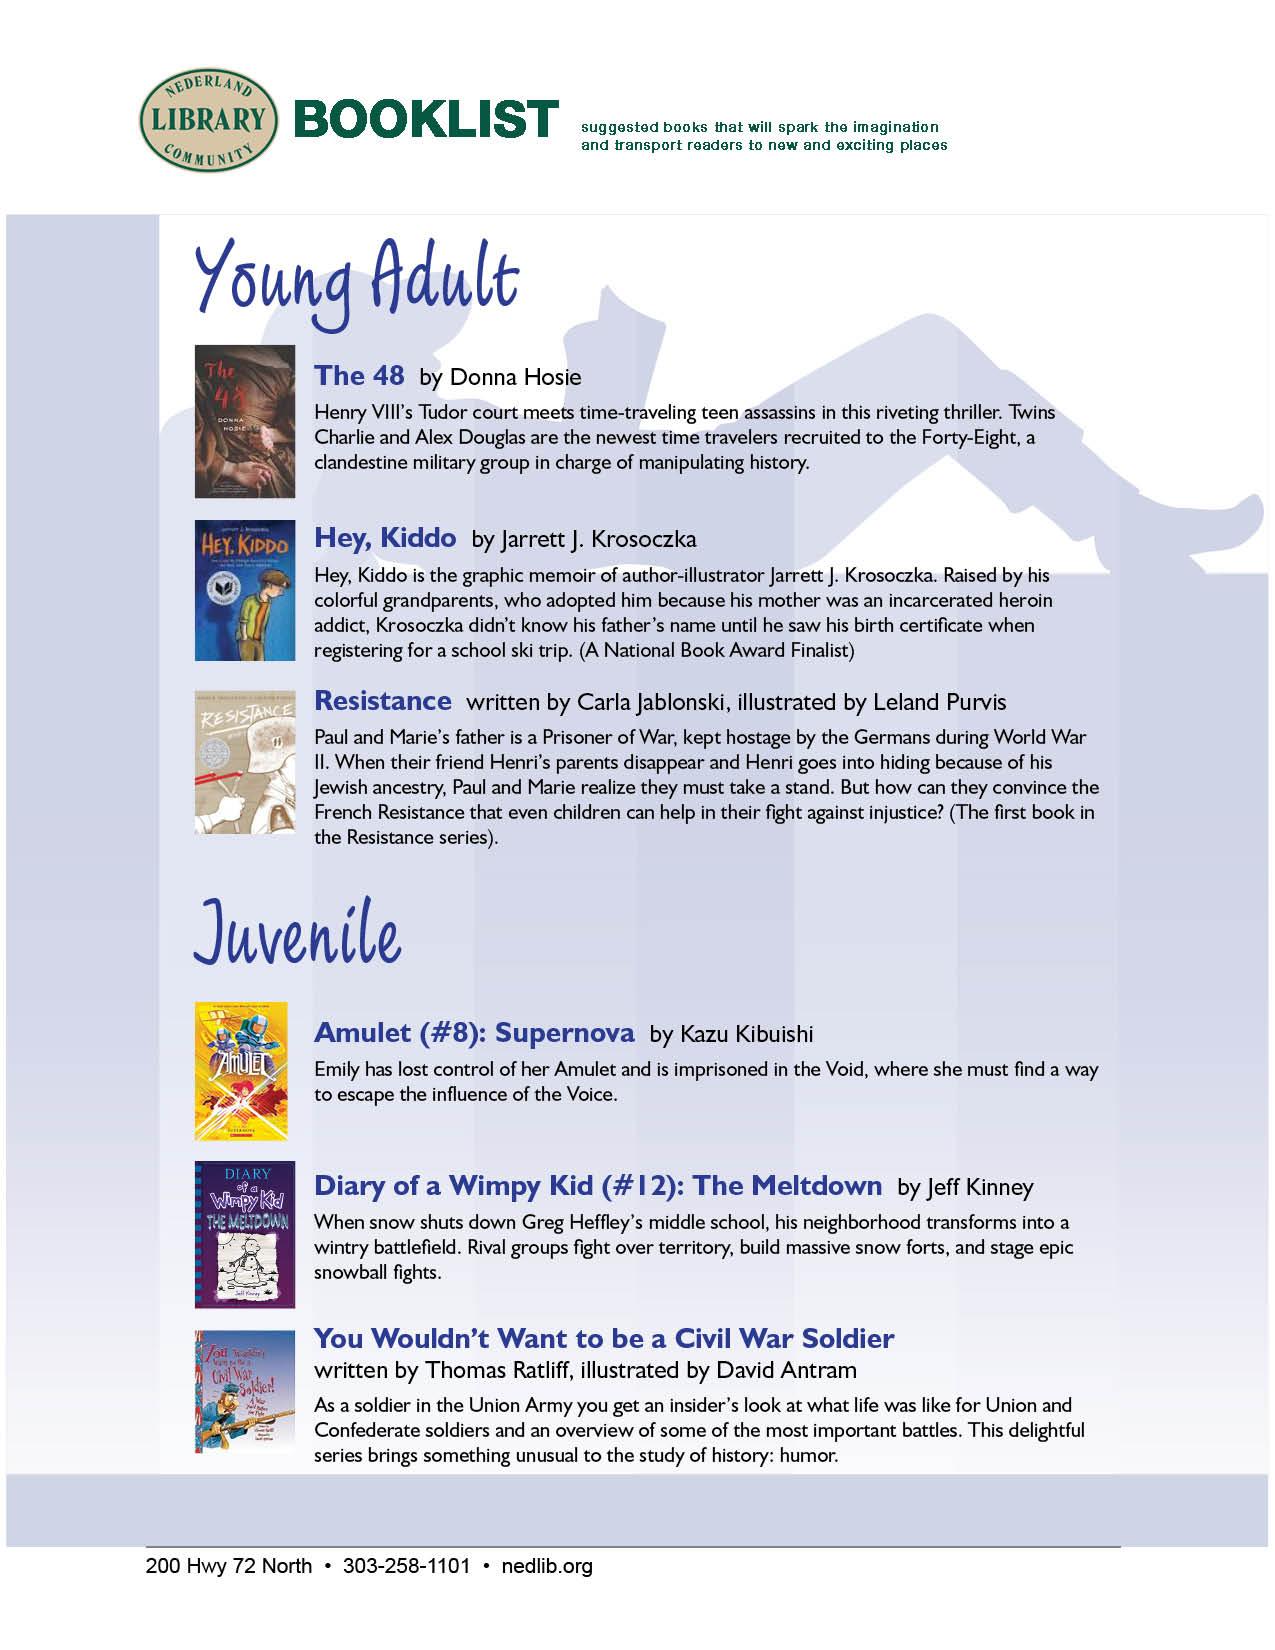 YA-Juvenile